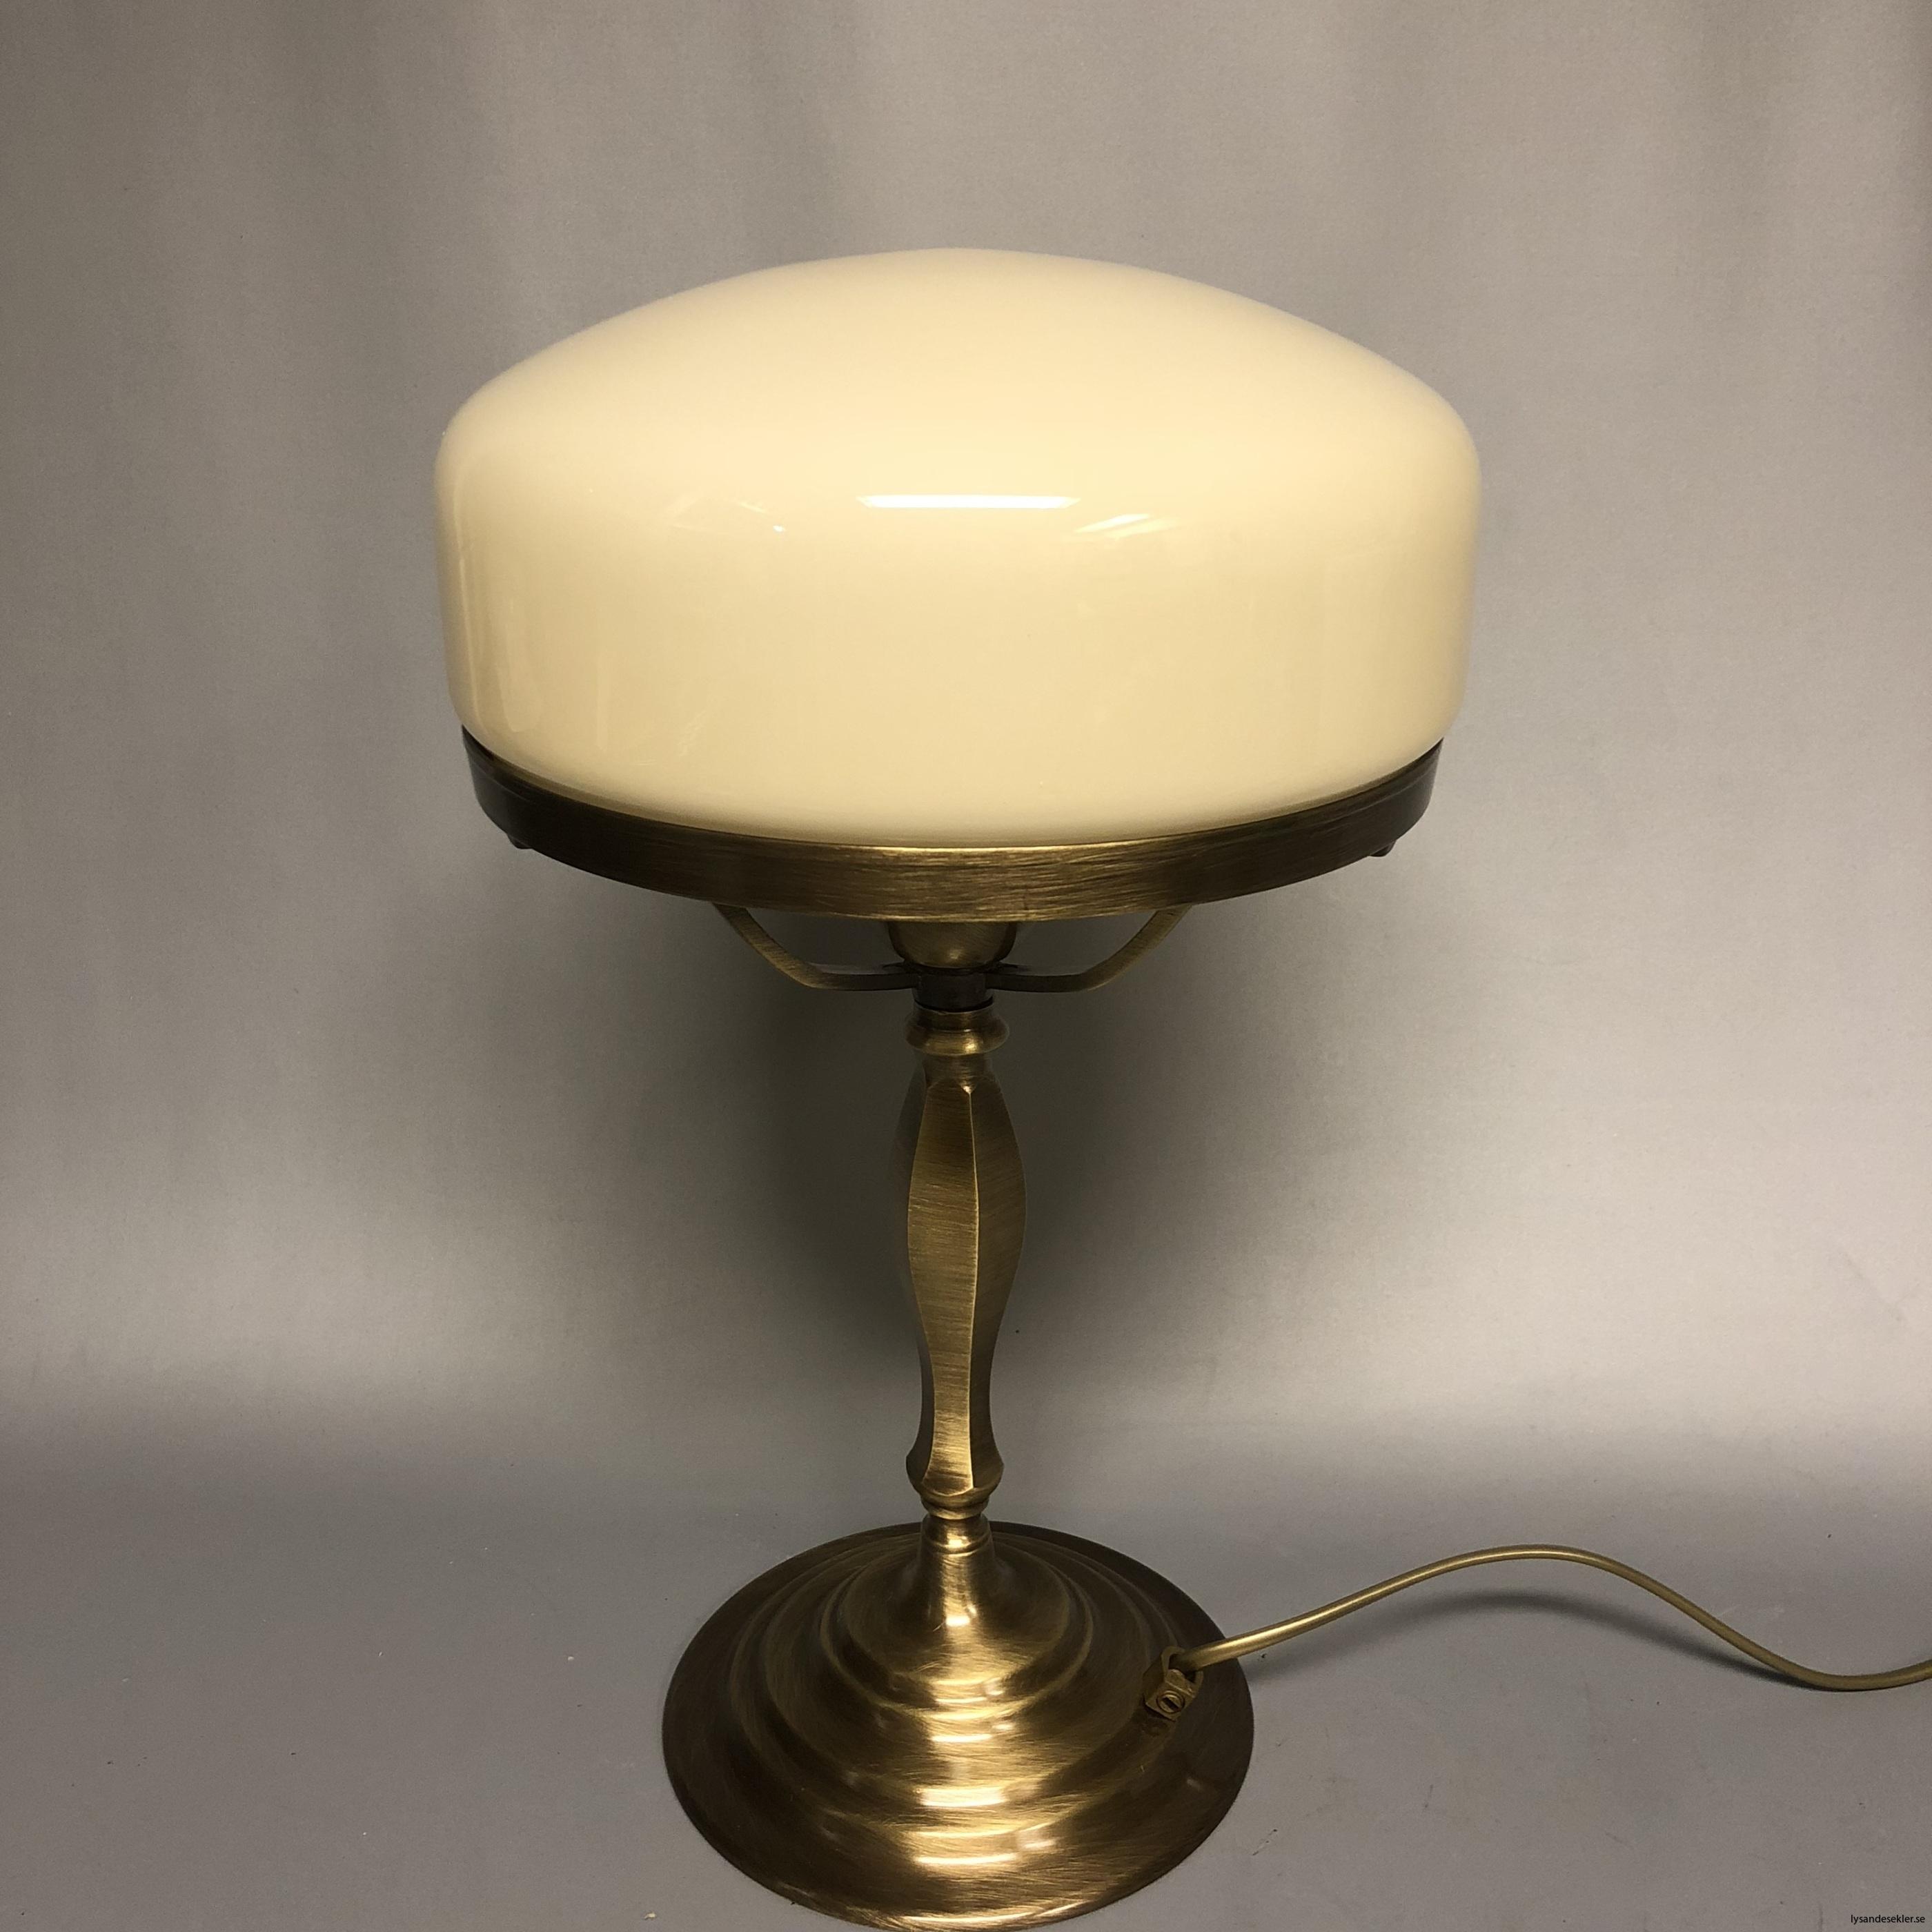 strindbergslampa strindbergslampor strindberg lampa skärm kupa strindbergsskärm strindbergskupa43